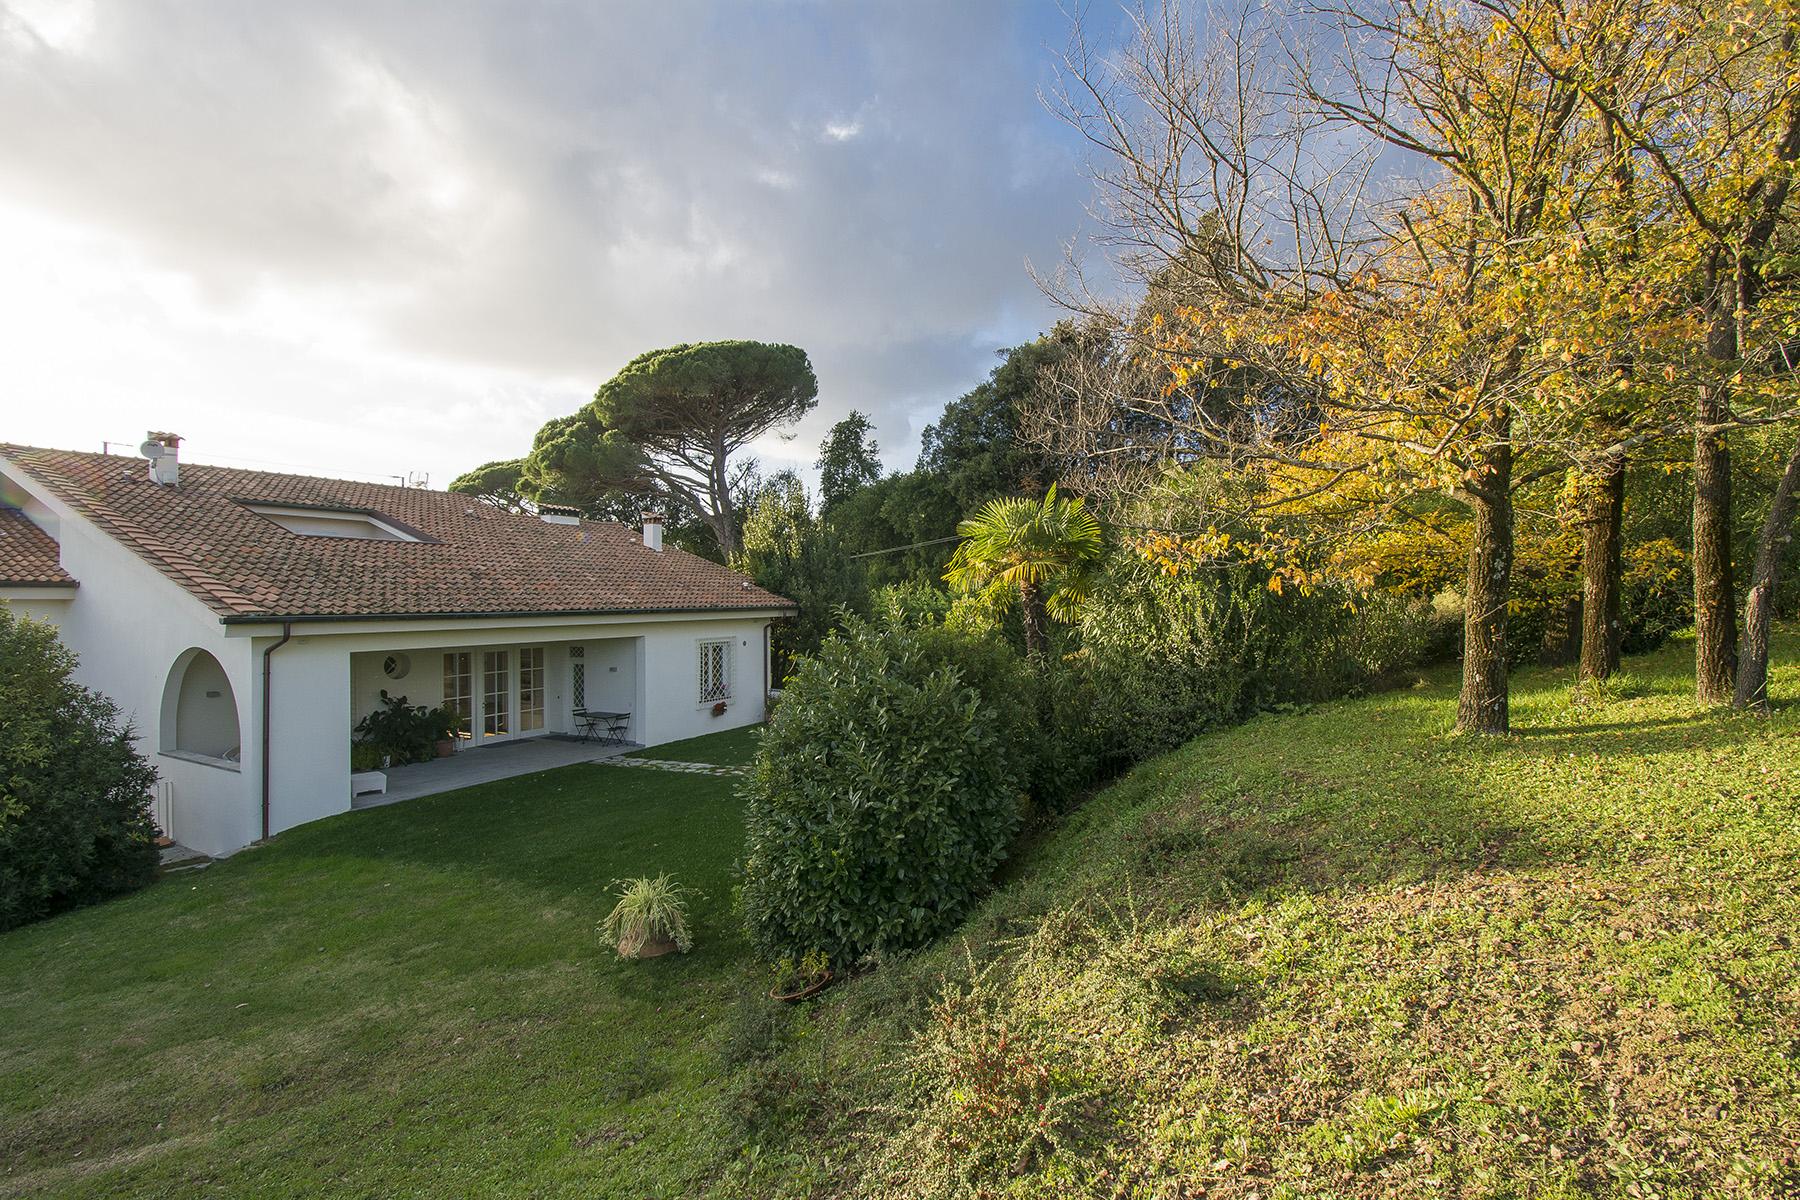 Villa in Vendita a Lucca: 5 locali, 470 mq - Foto 30